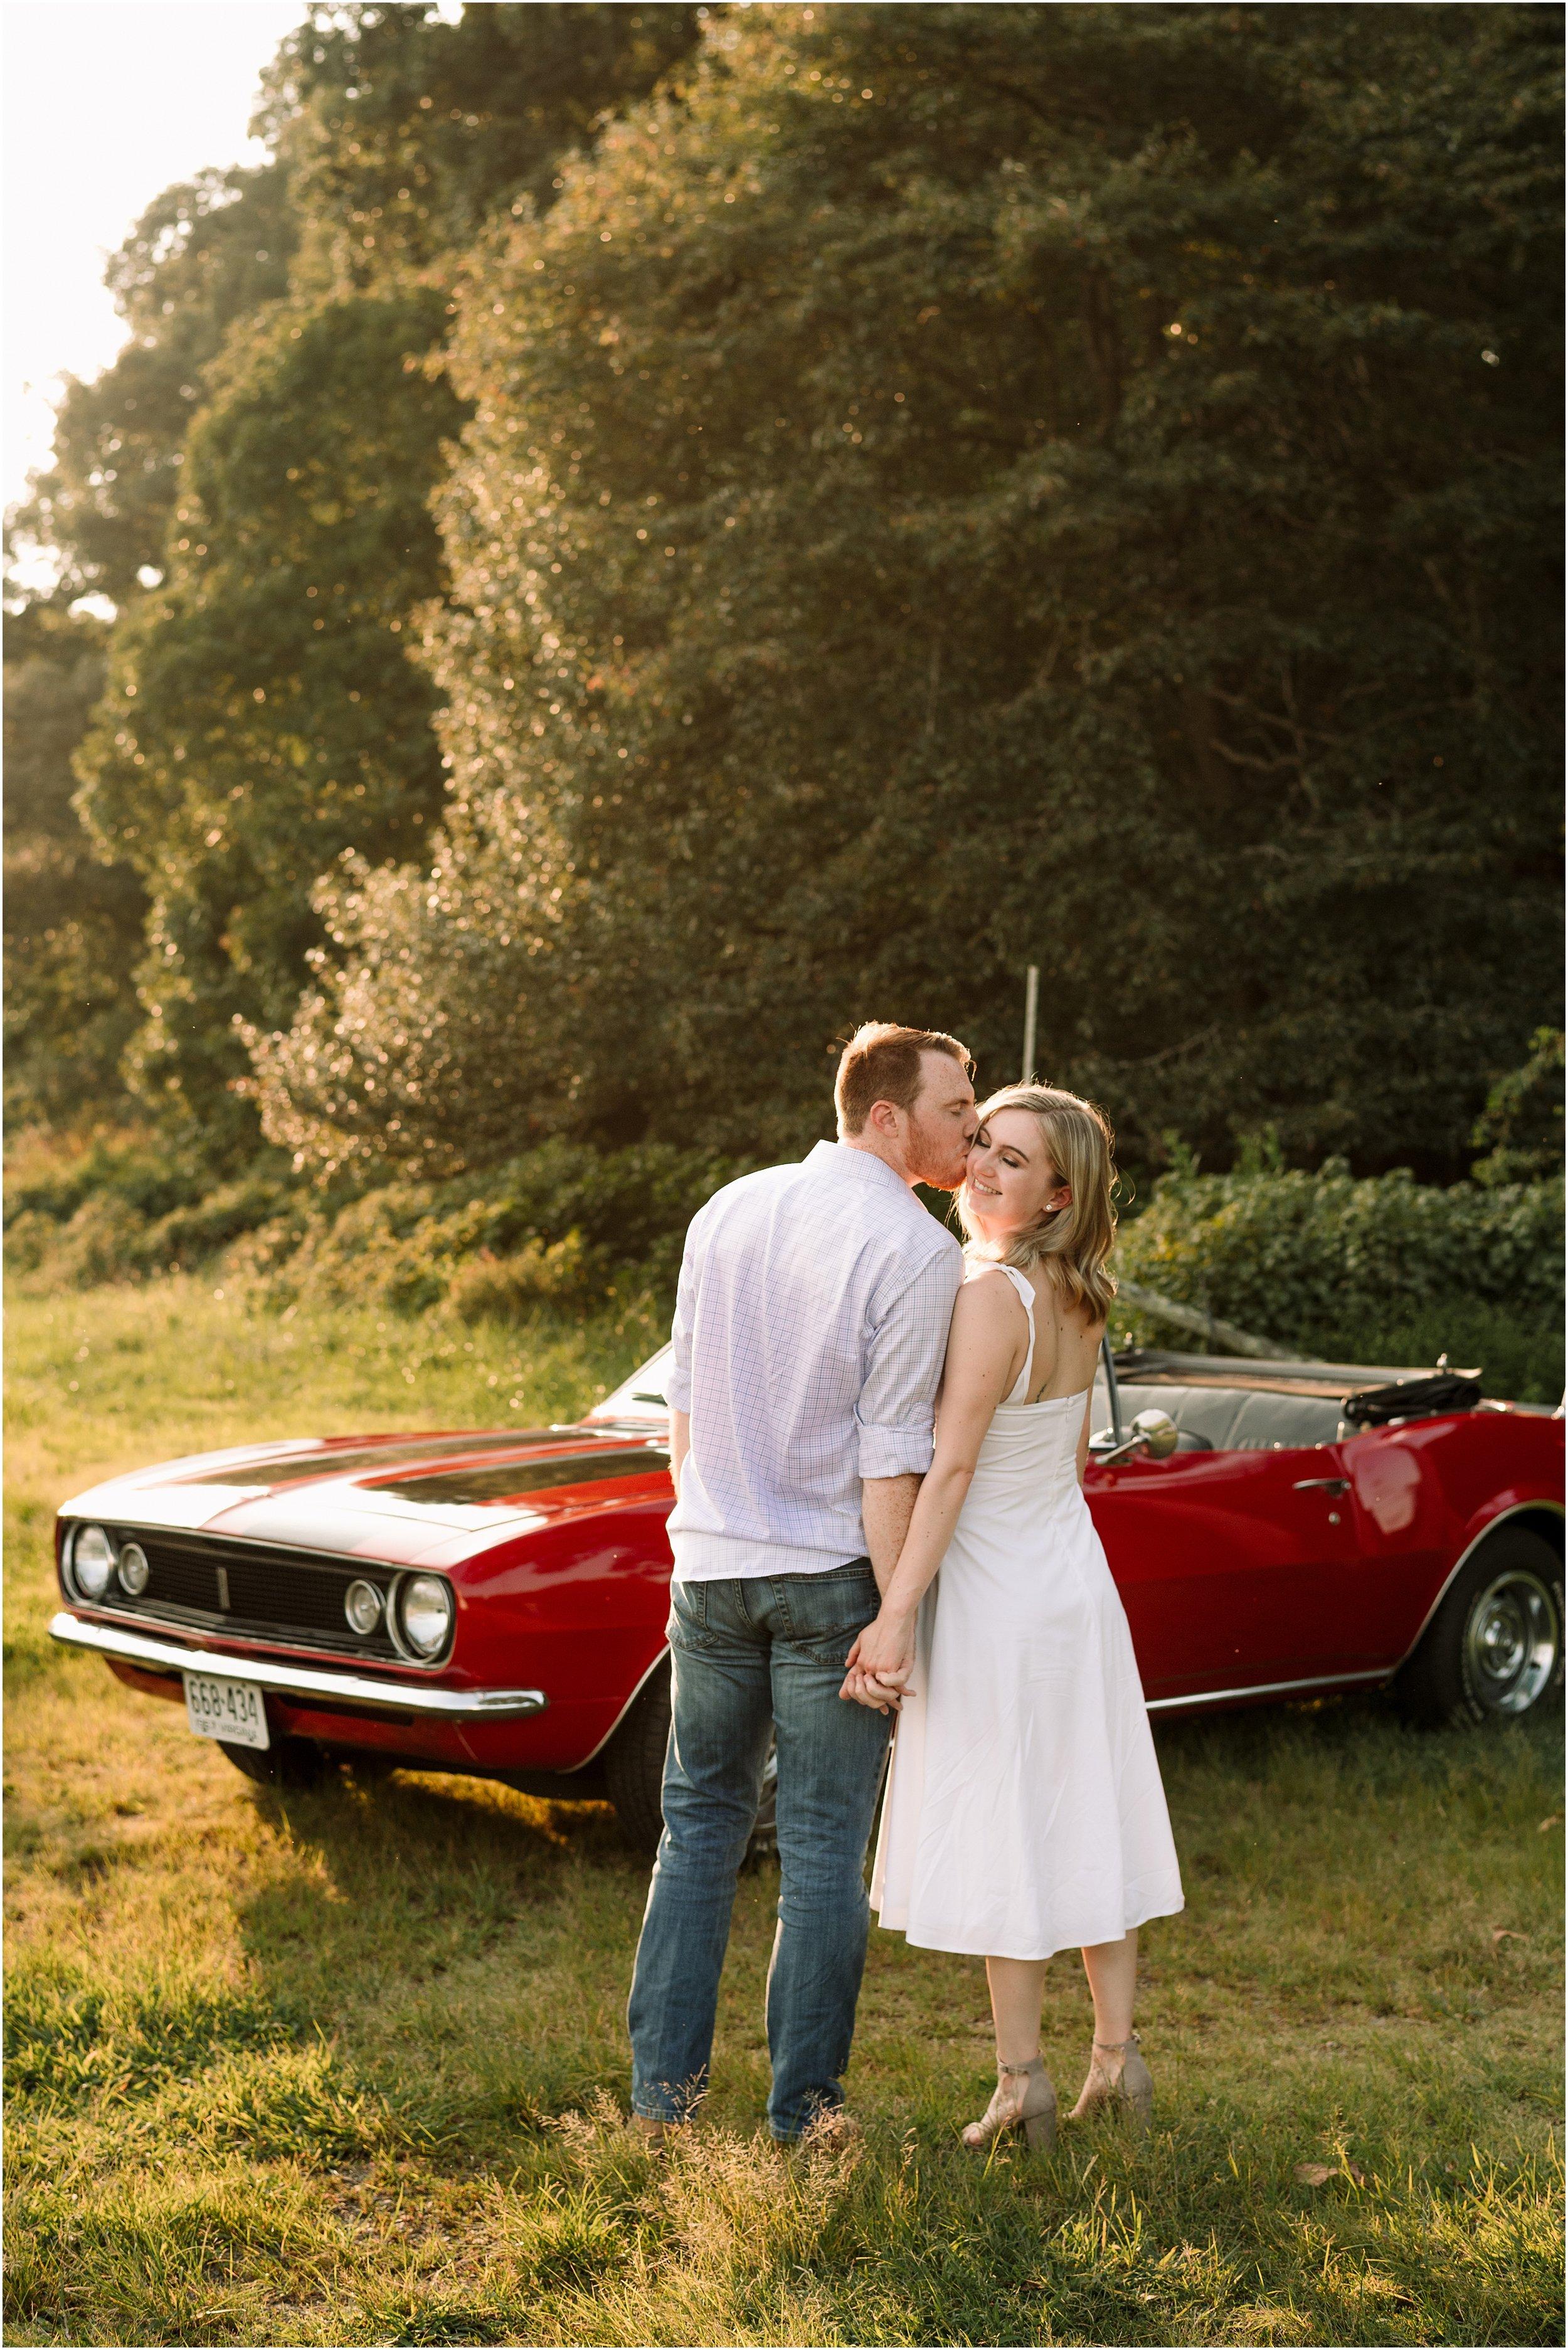 hannah leigh photography antique car engagement session virginia_1085.jpg